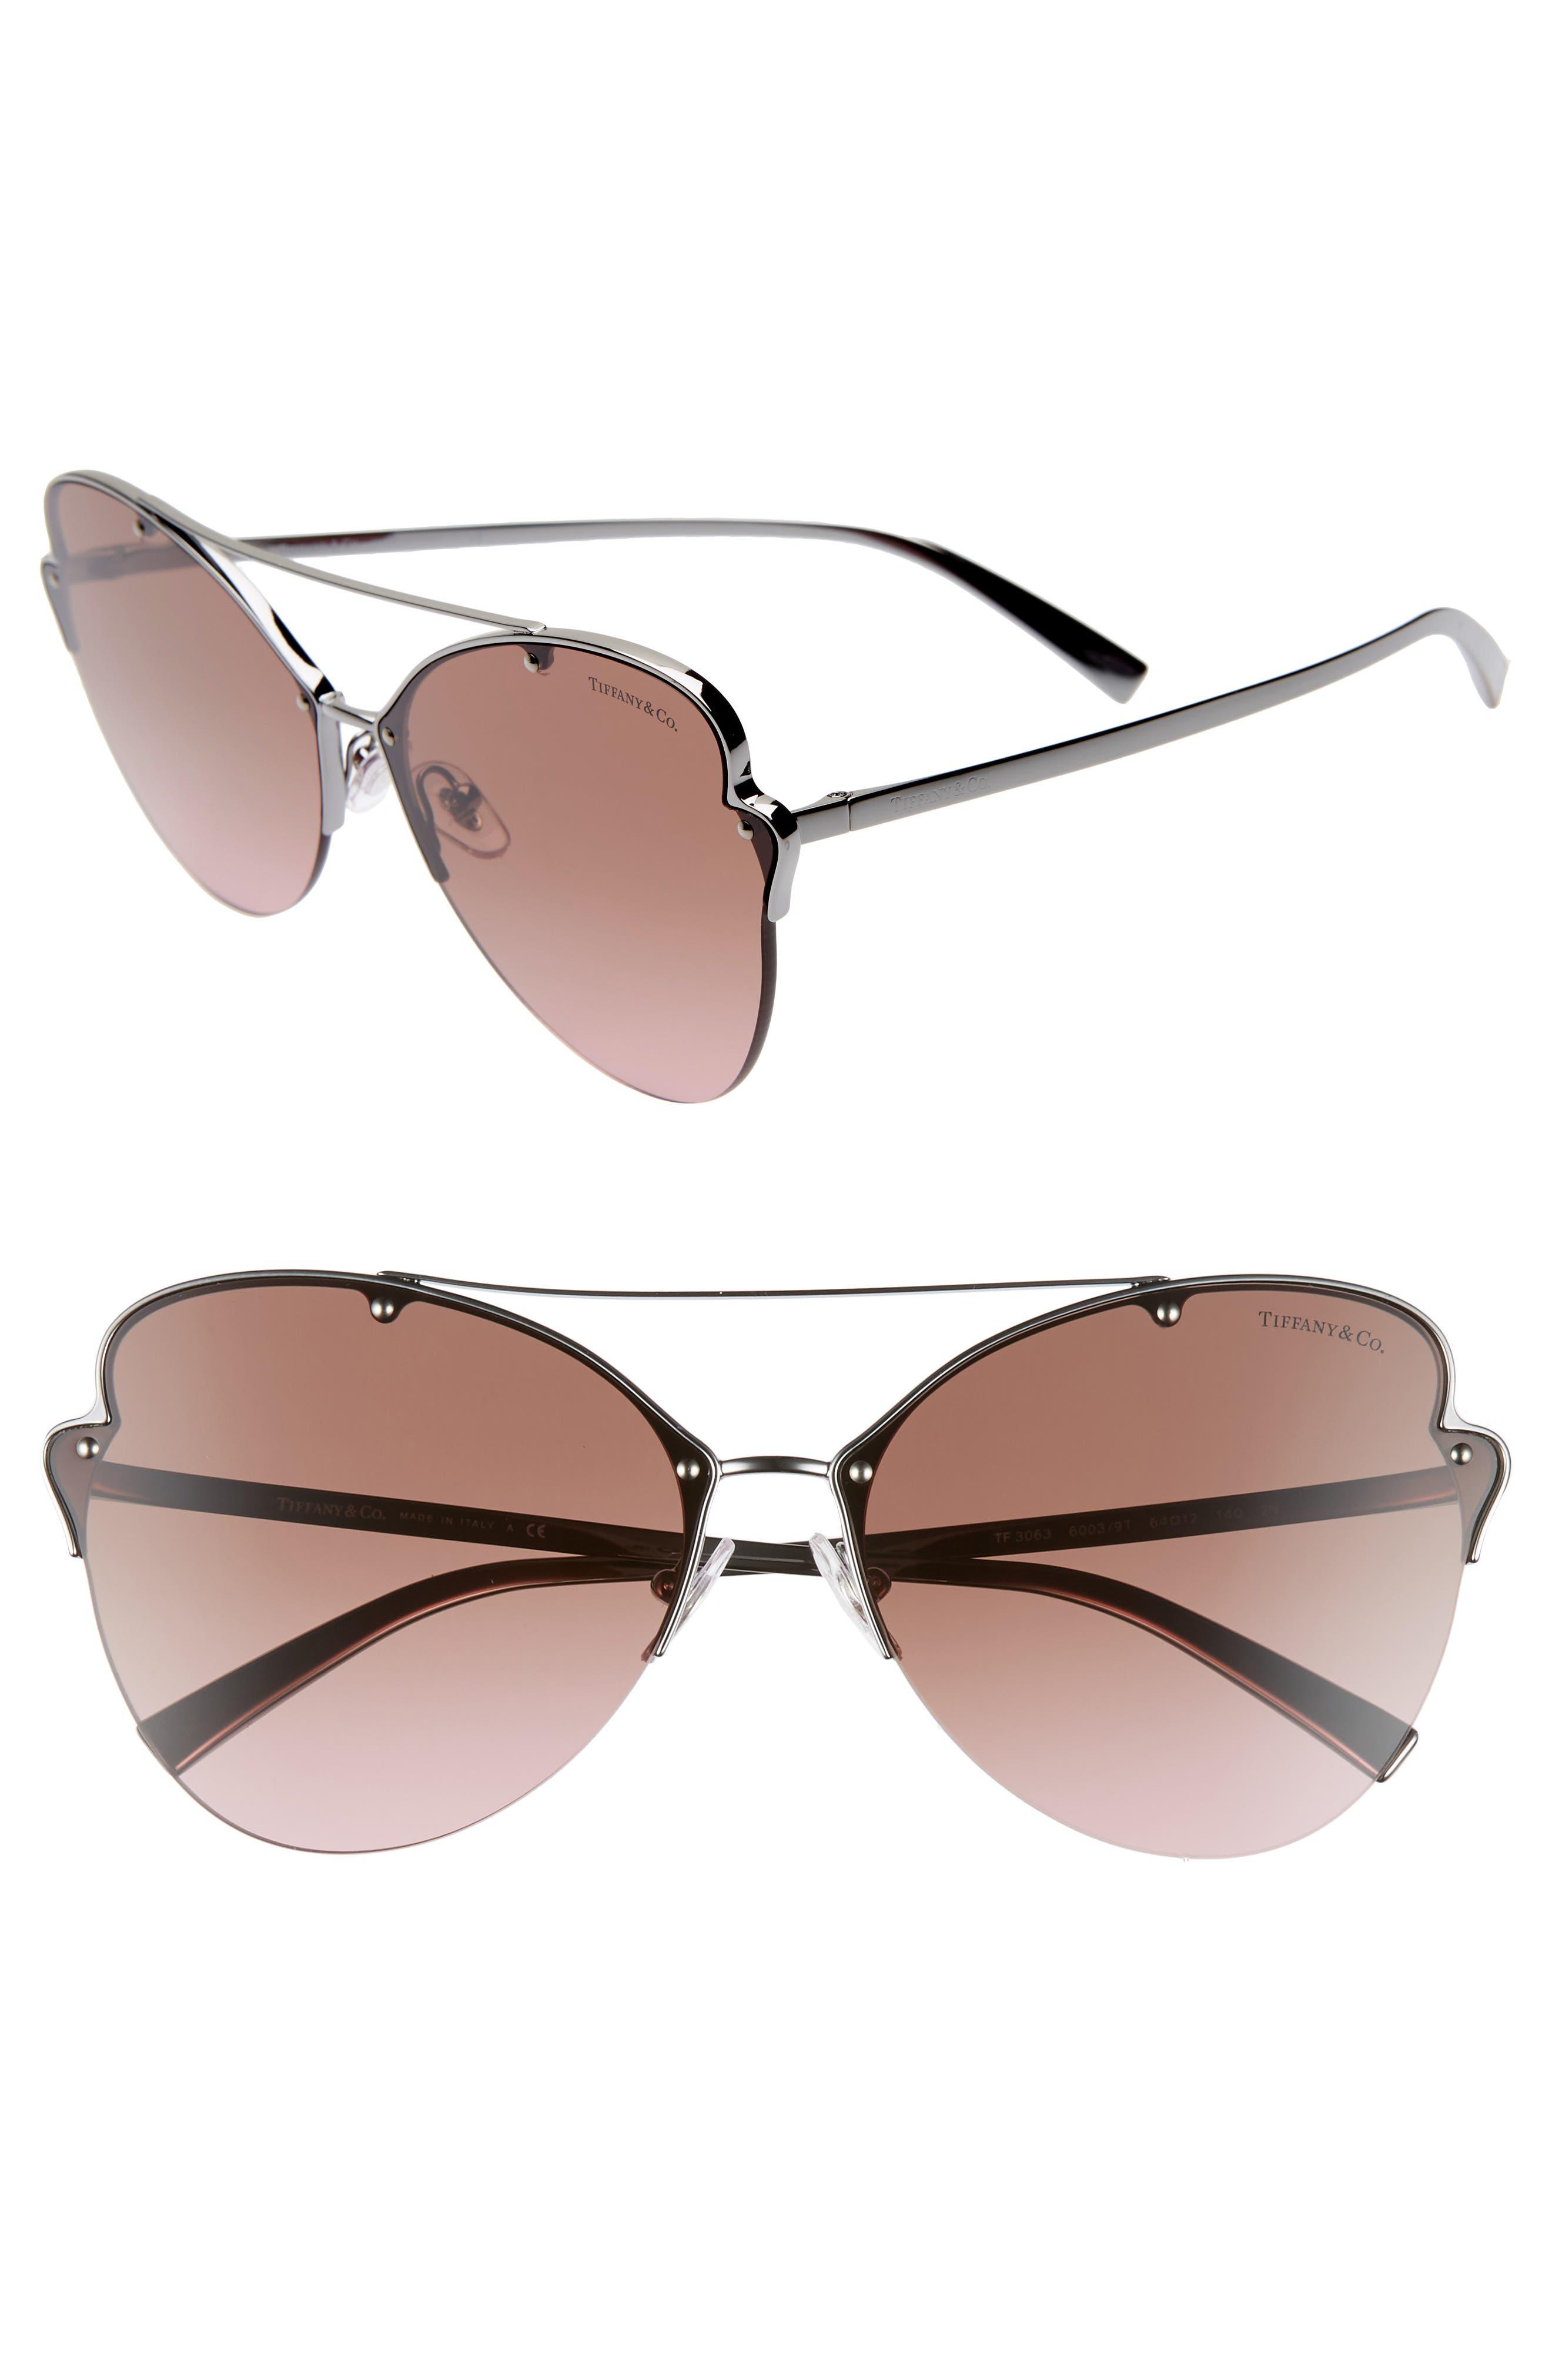 e6191967380 Sunglasses Tiffany   Co